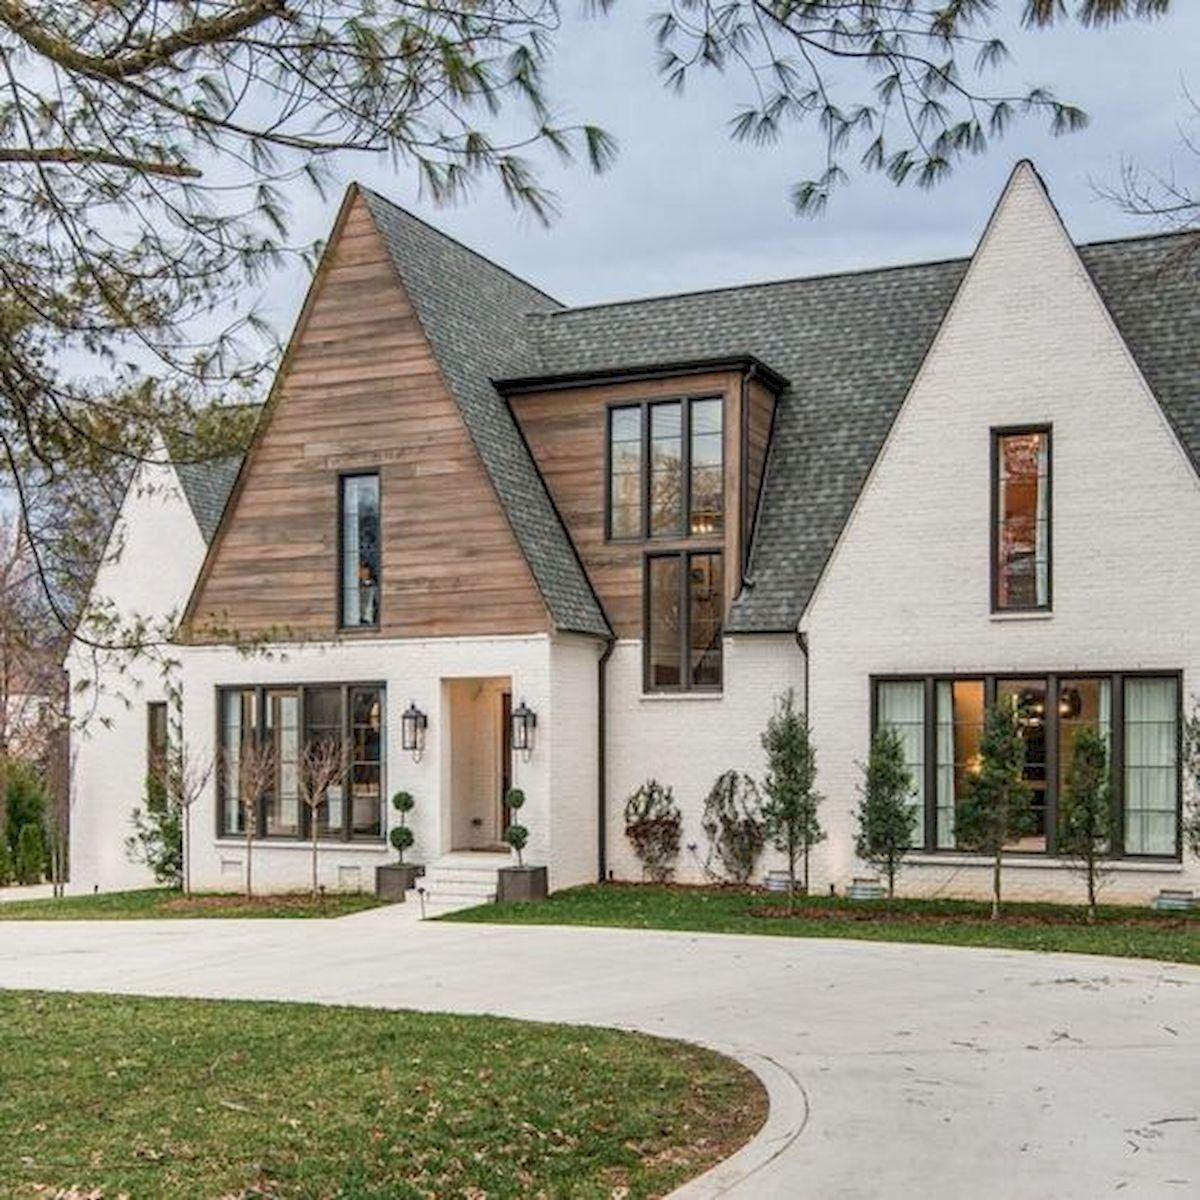 Photo of 33 Beautiful Modern Farmhouse Exterior Design Ideas – 33DECOR